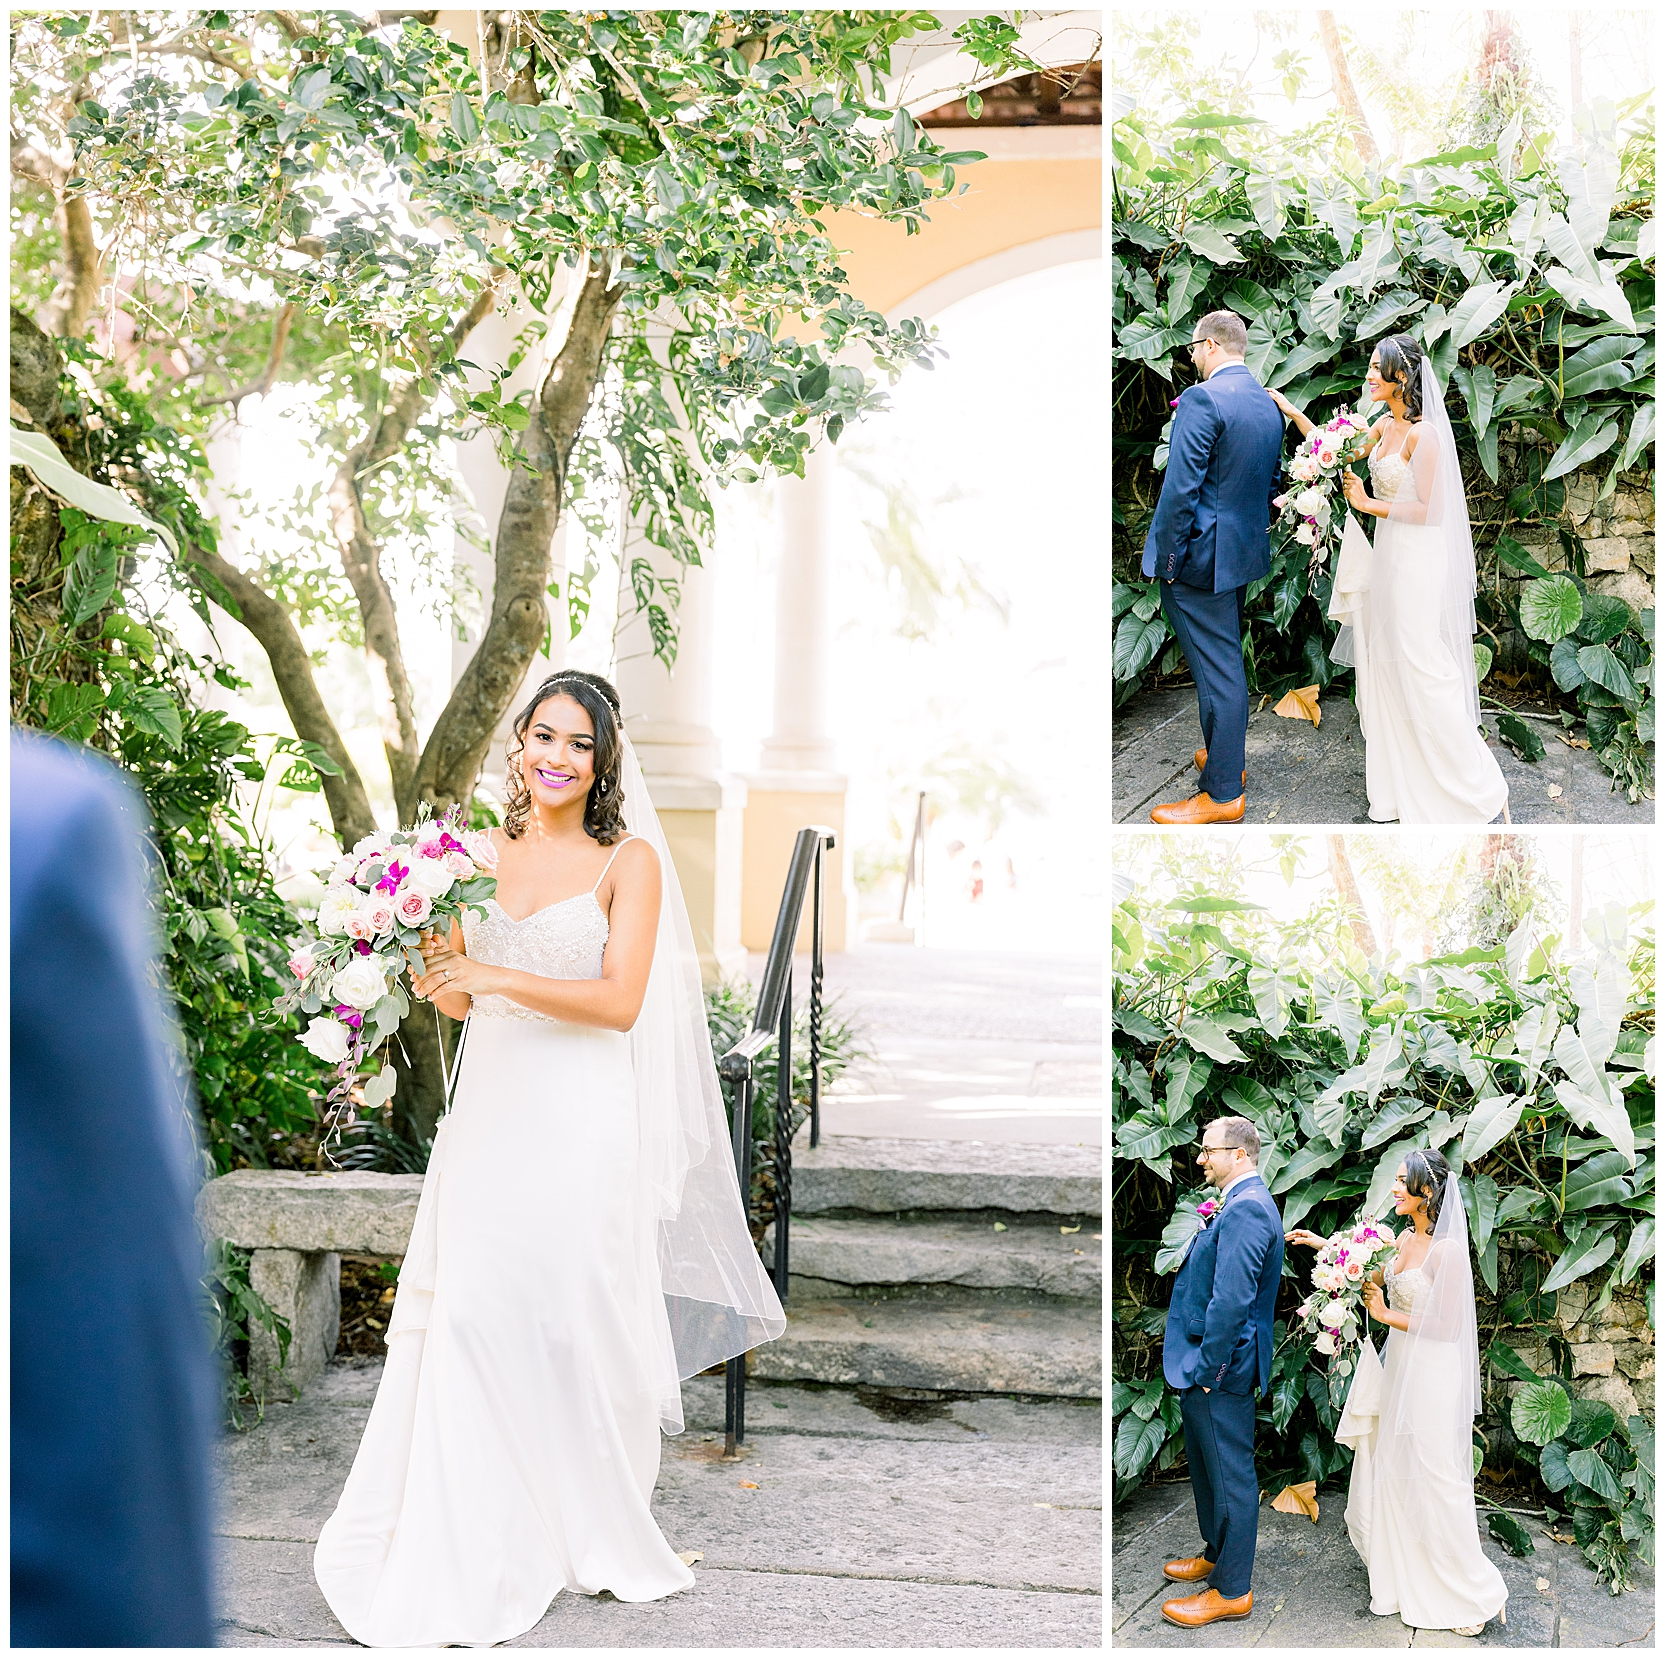 jessicafredericks_lakeland_tampa_wedding_purple_crazy hour_0016.jpg